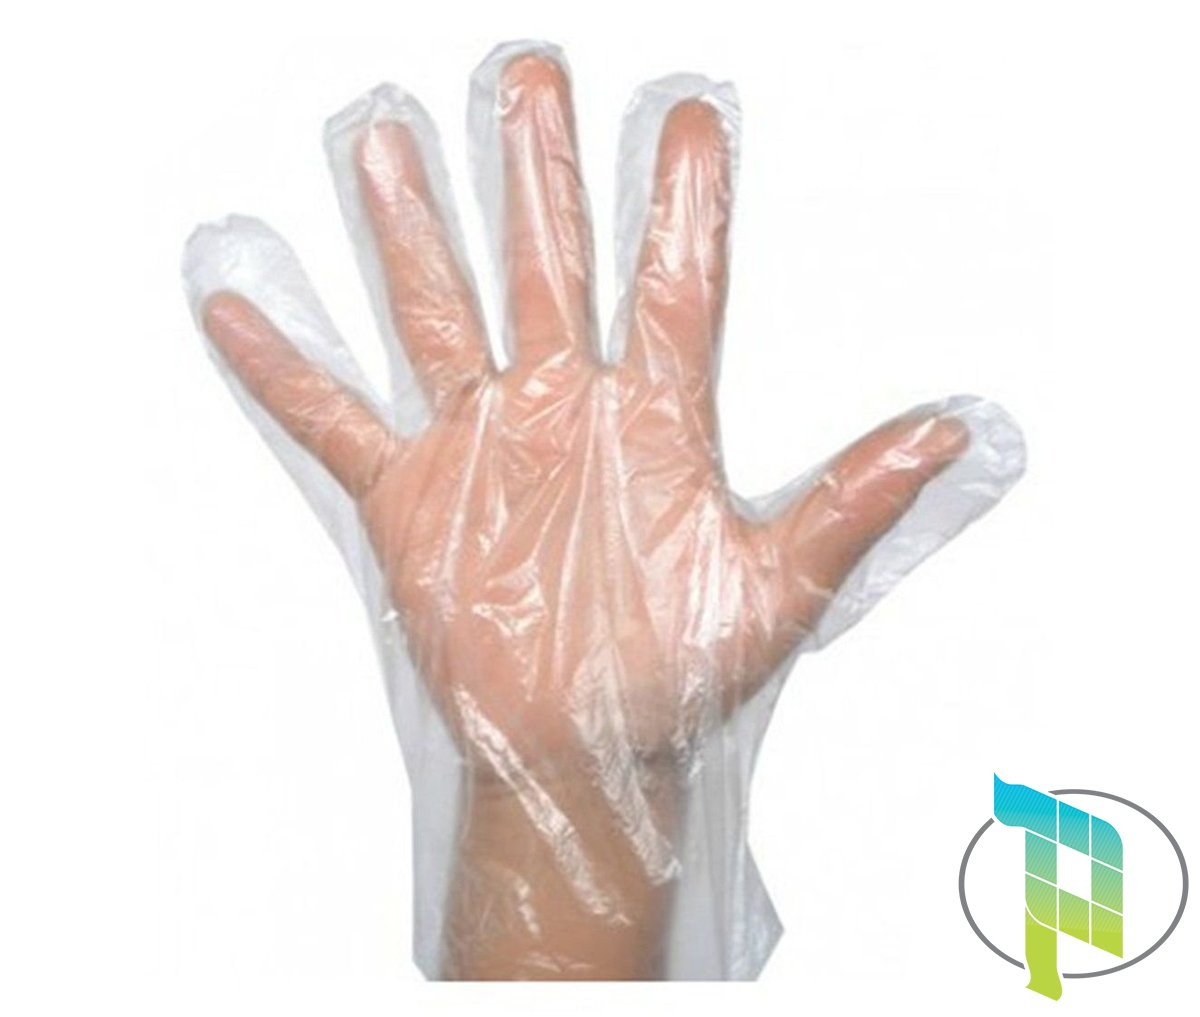 Palucart-1000-guanti-trasparenti-monouso-in-polietilene-guanti-polietilene-monouso